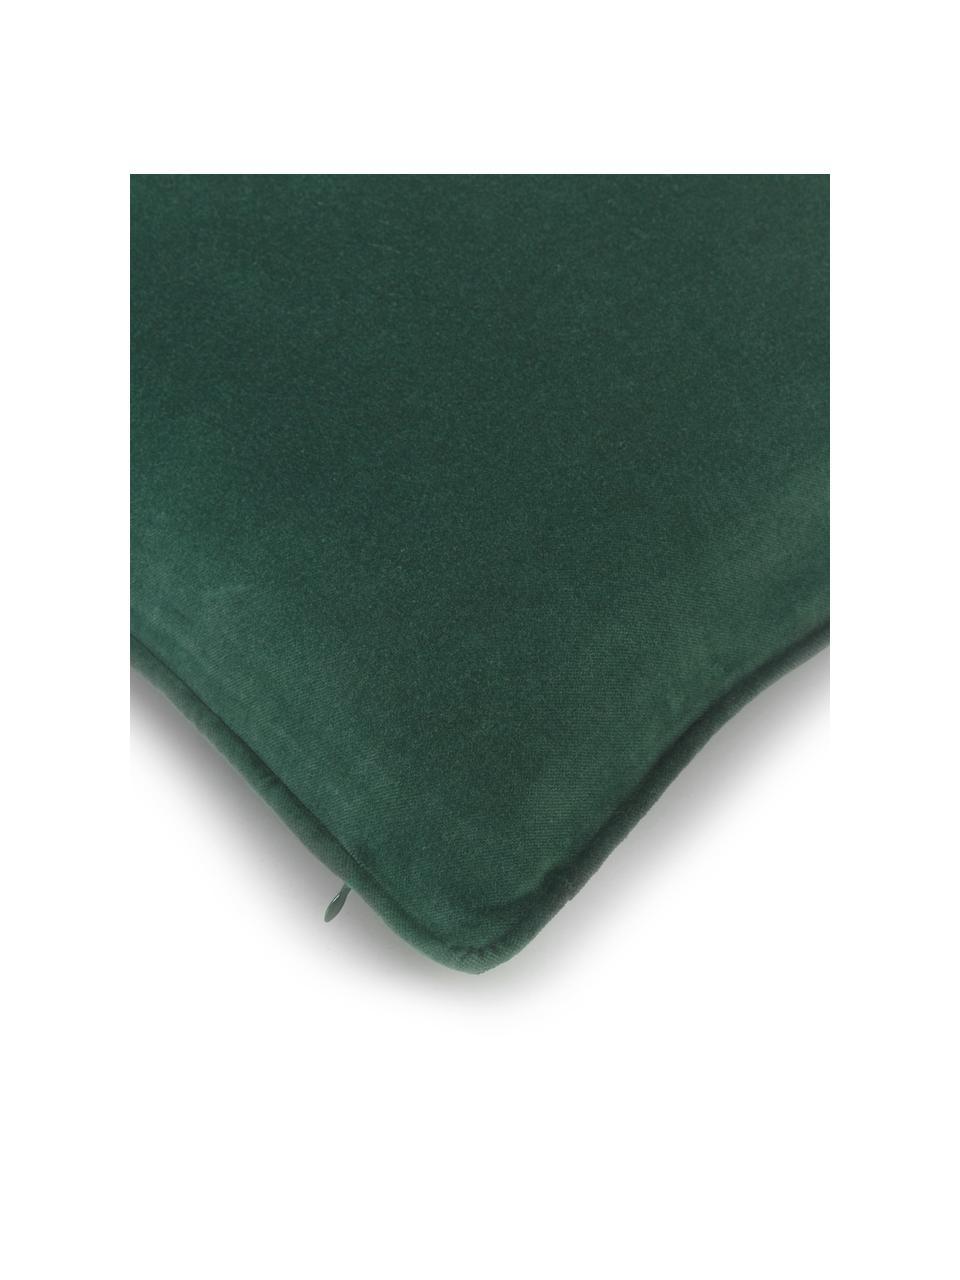 Einfarbige Samt-Kissenhülle Dana in Smaragdgrün, 100% Baumwollsamt, Smaragdgrün, 40 x 40 cm